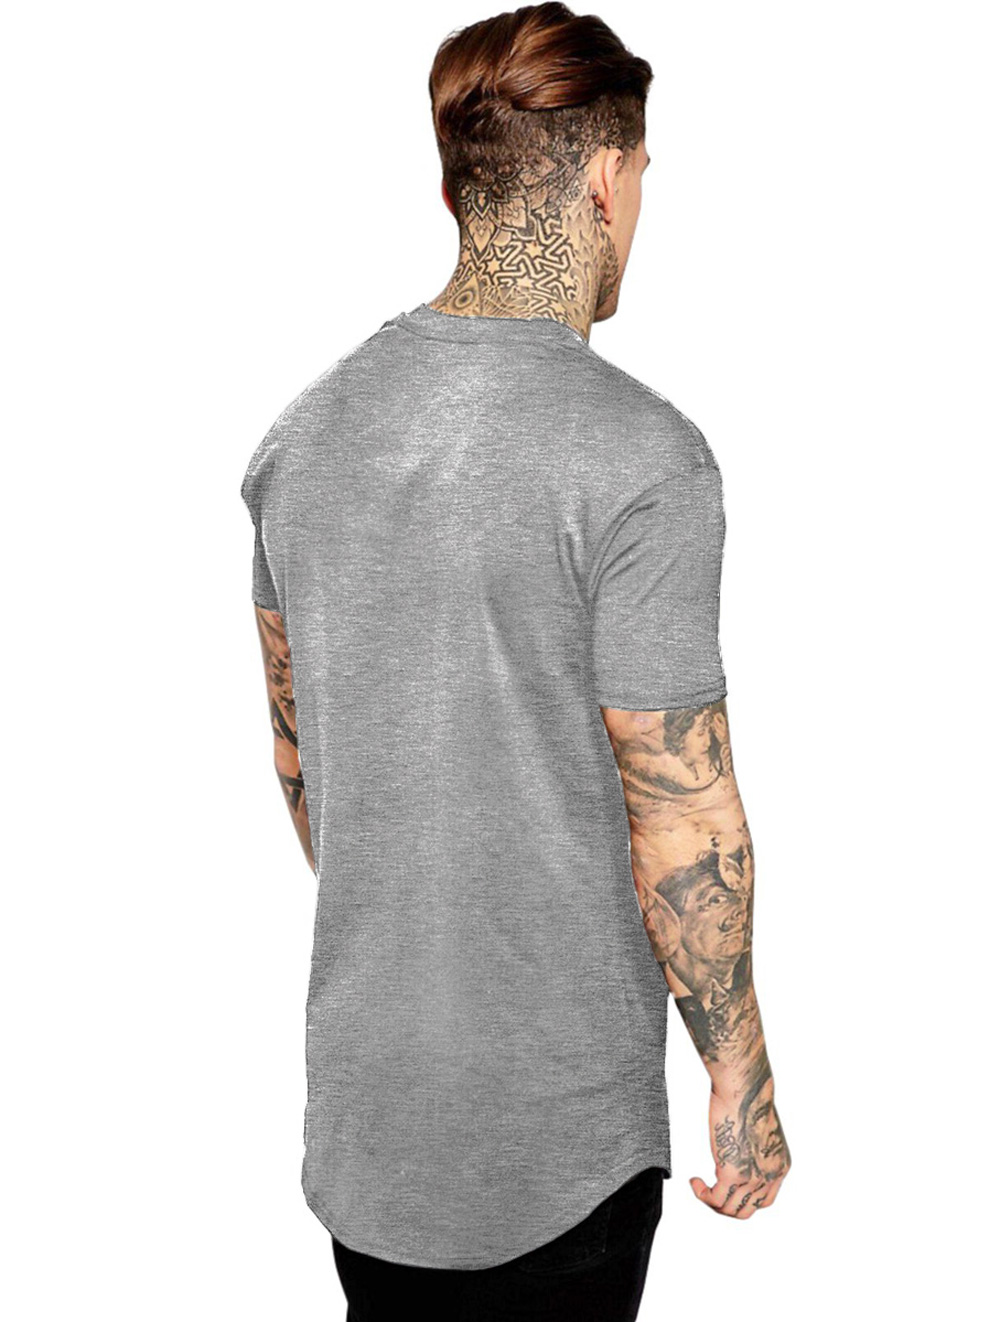 Camiseta Masculina Oversized Long Line Jesus Cristã Religiosa ES_169